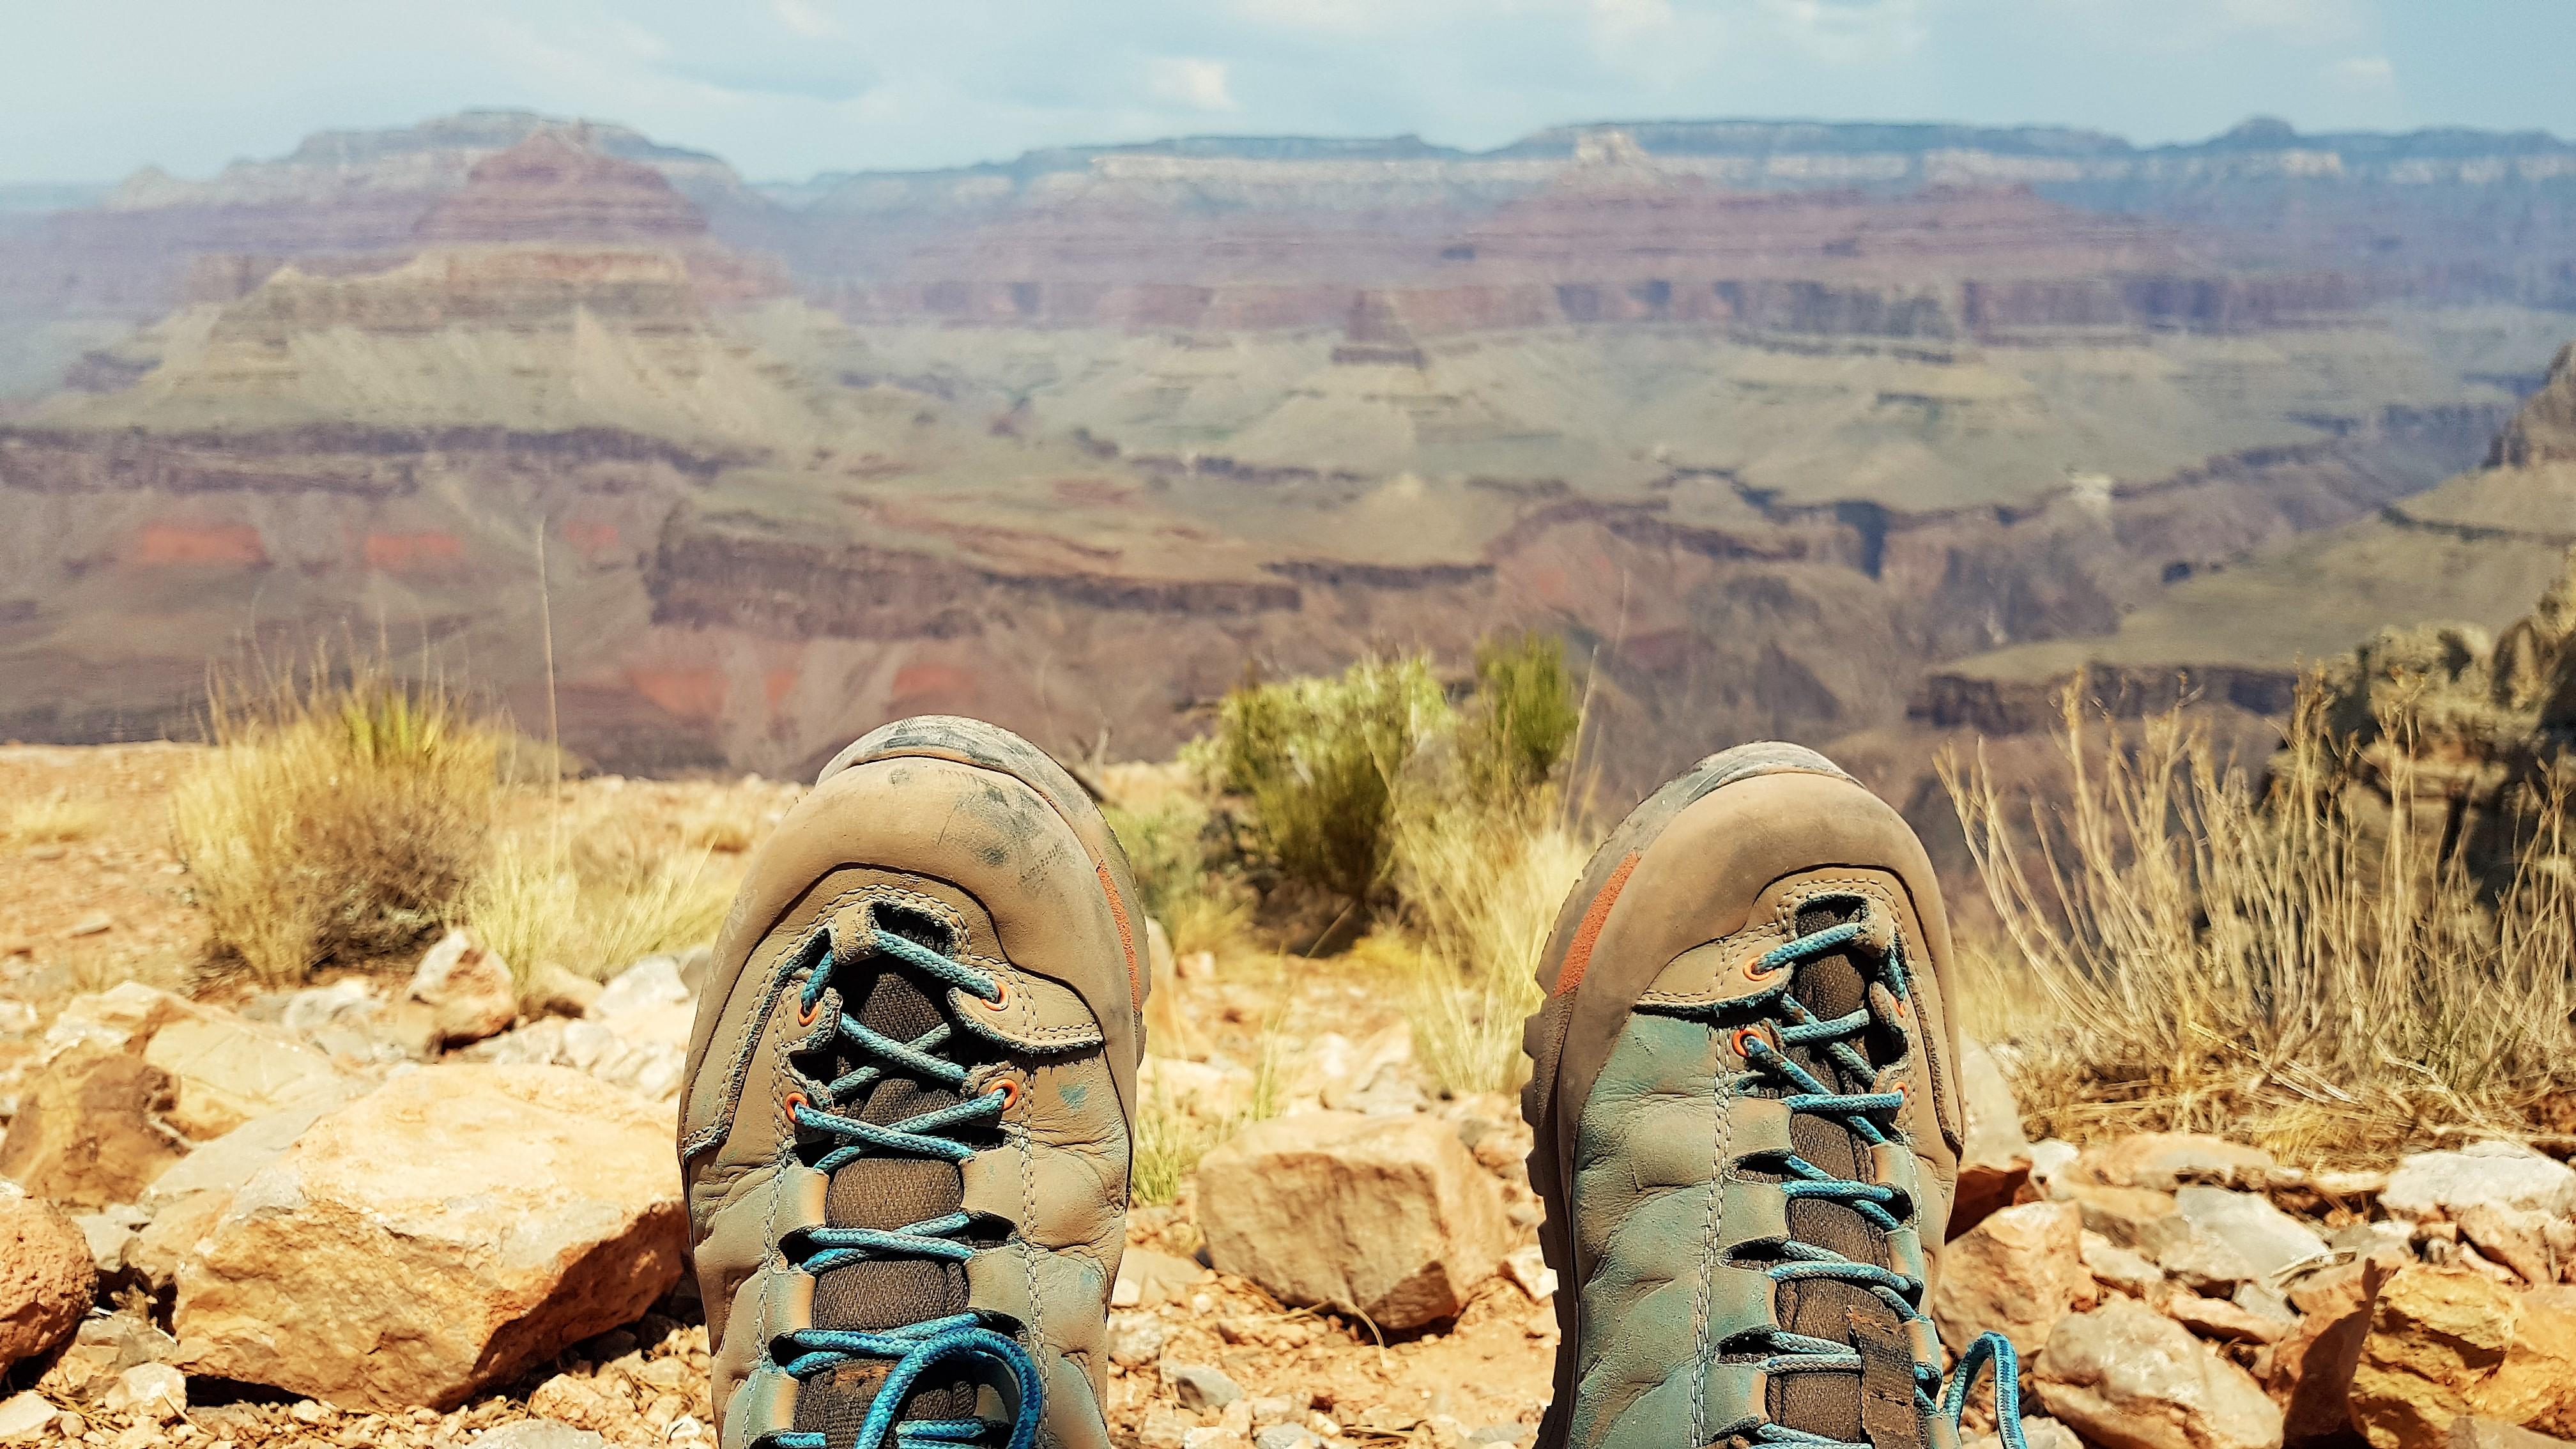 Aussicht am Skeleton Point des South Kaibab Trails